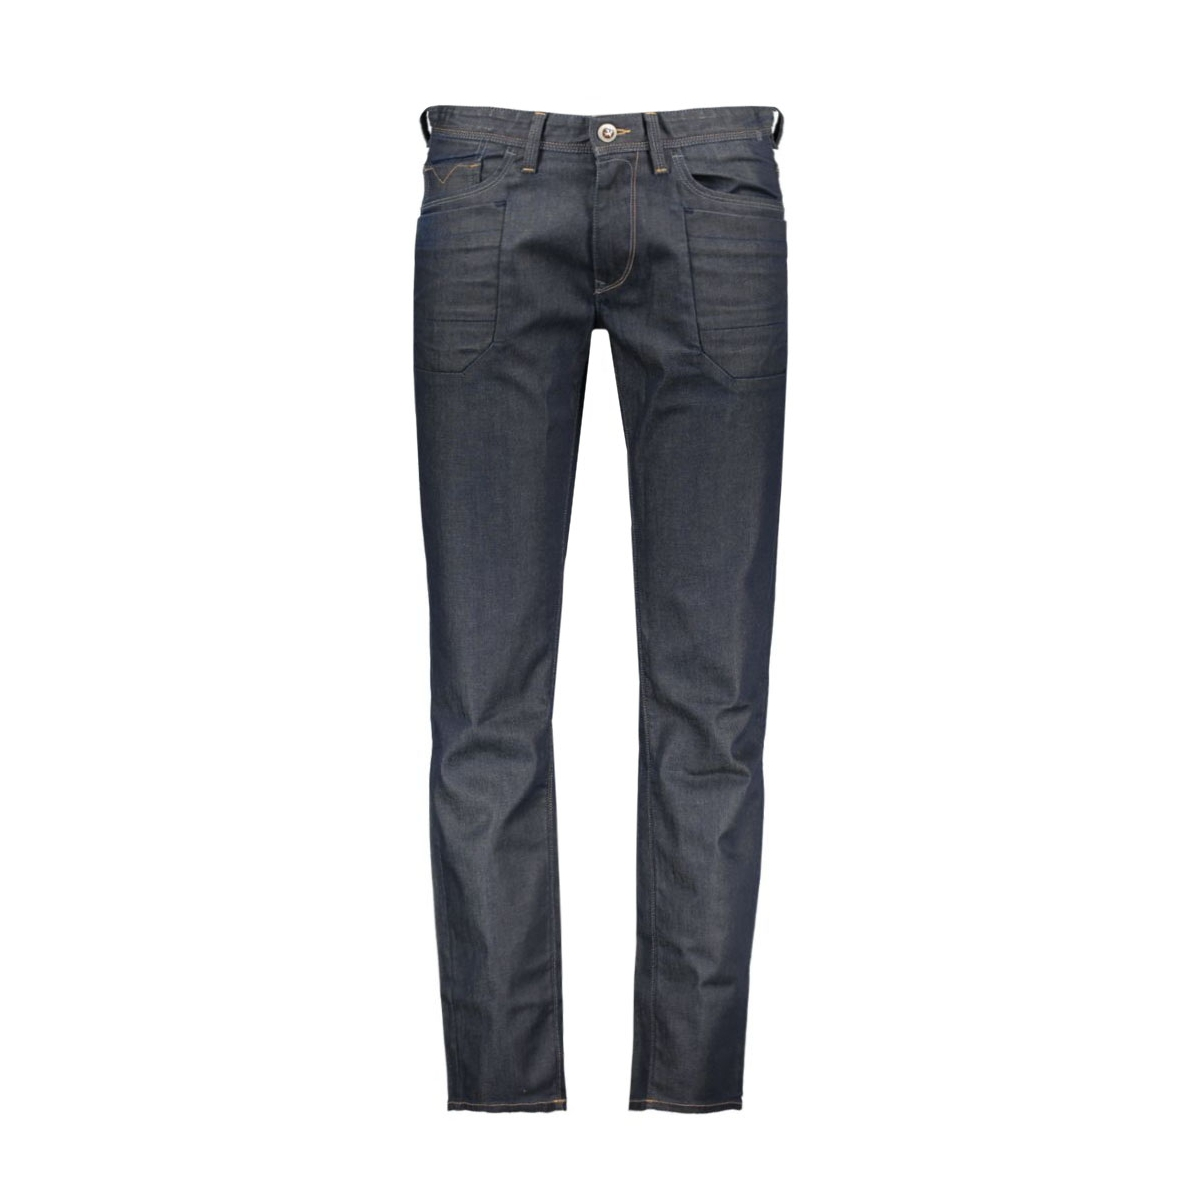 vtr520 v9 cruizer tumbled vanguard jeans tdb